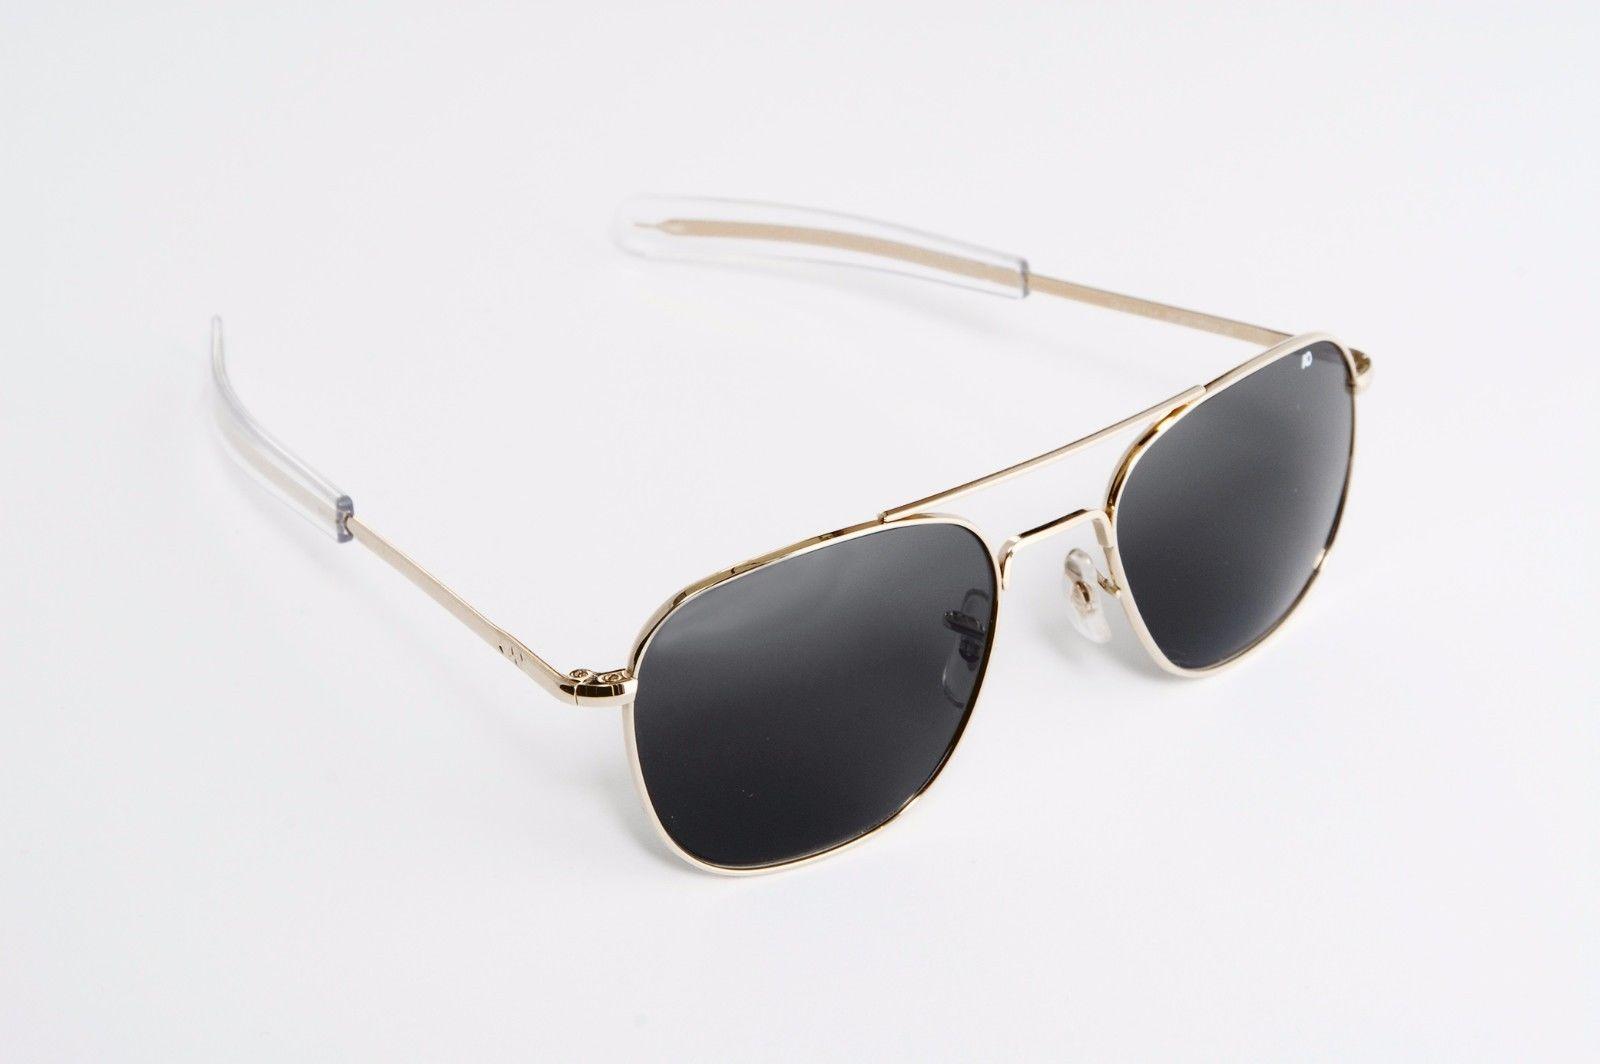 Details about AO Eyewear Original Pilot Sunglasses Classic Military  Sunglasses Since 1958 d3eba85aaa1